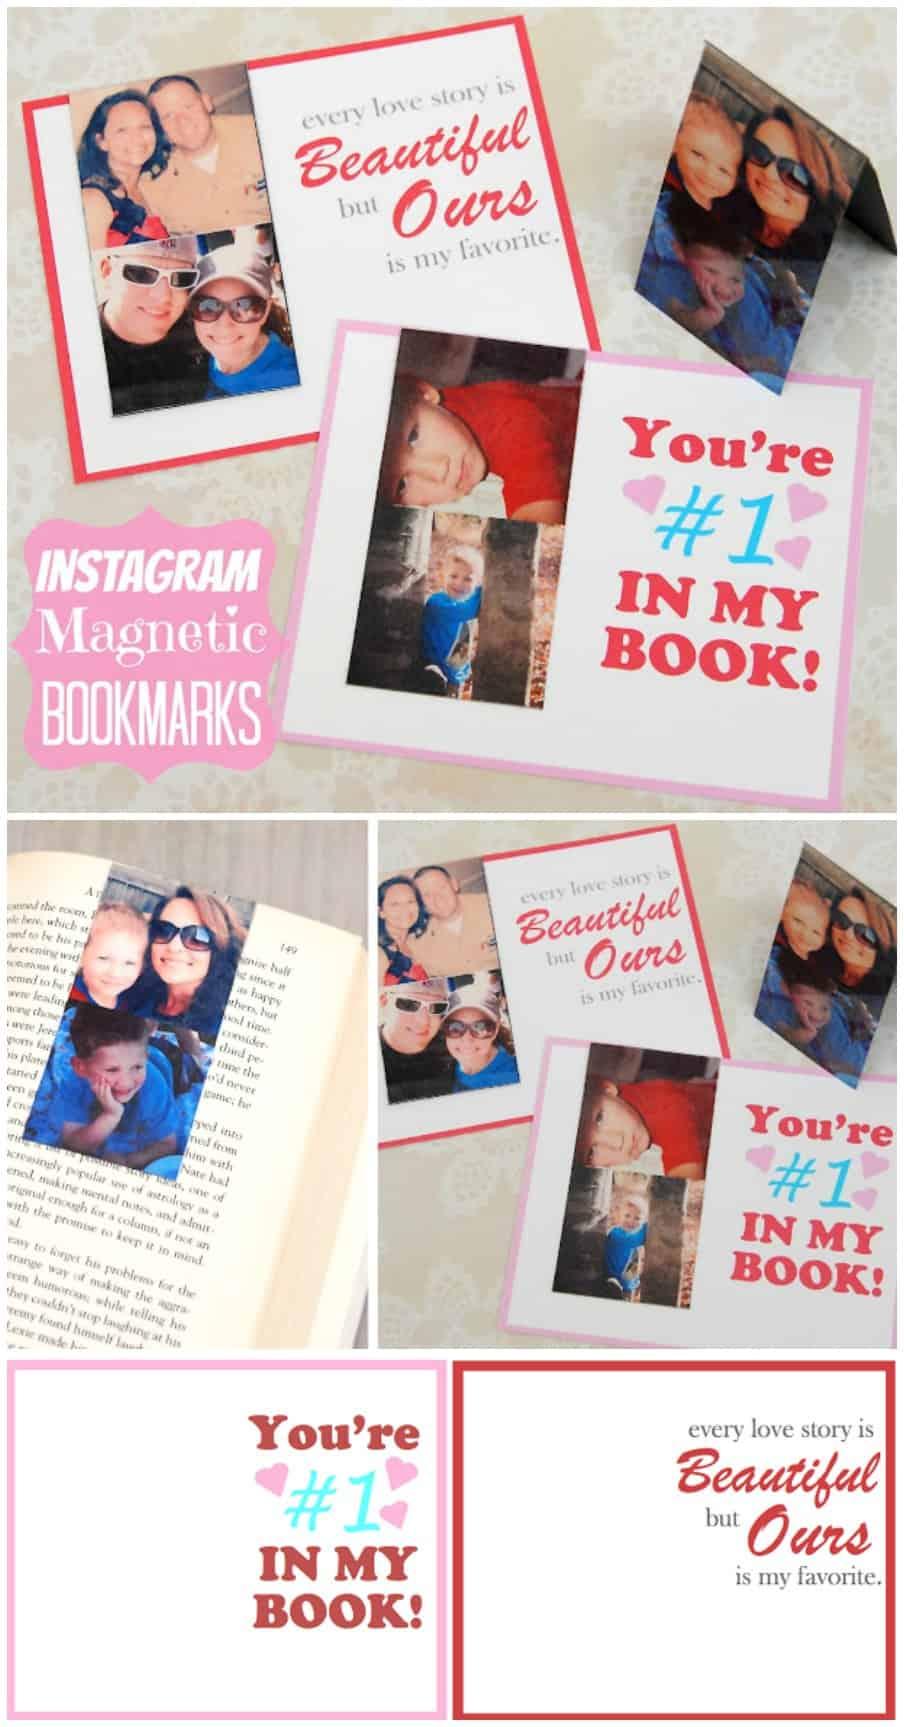 Instagram Magnetic Bookmarks